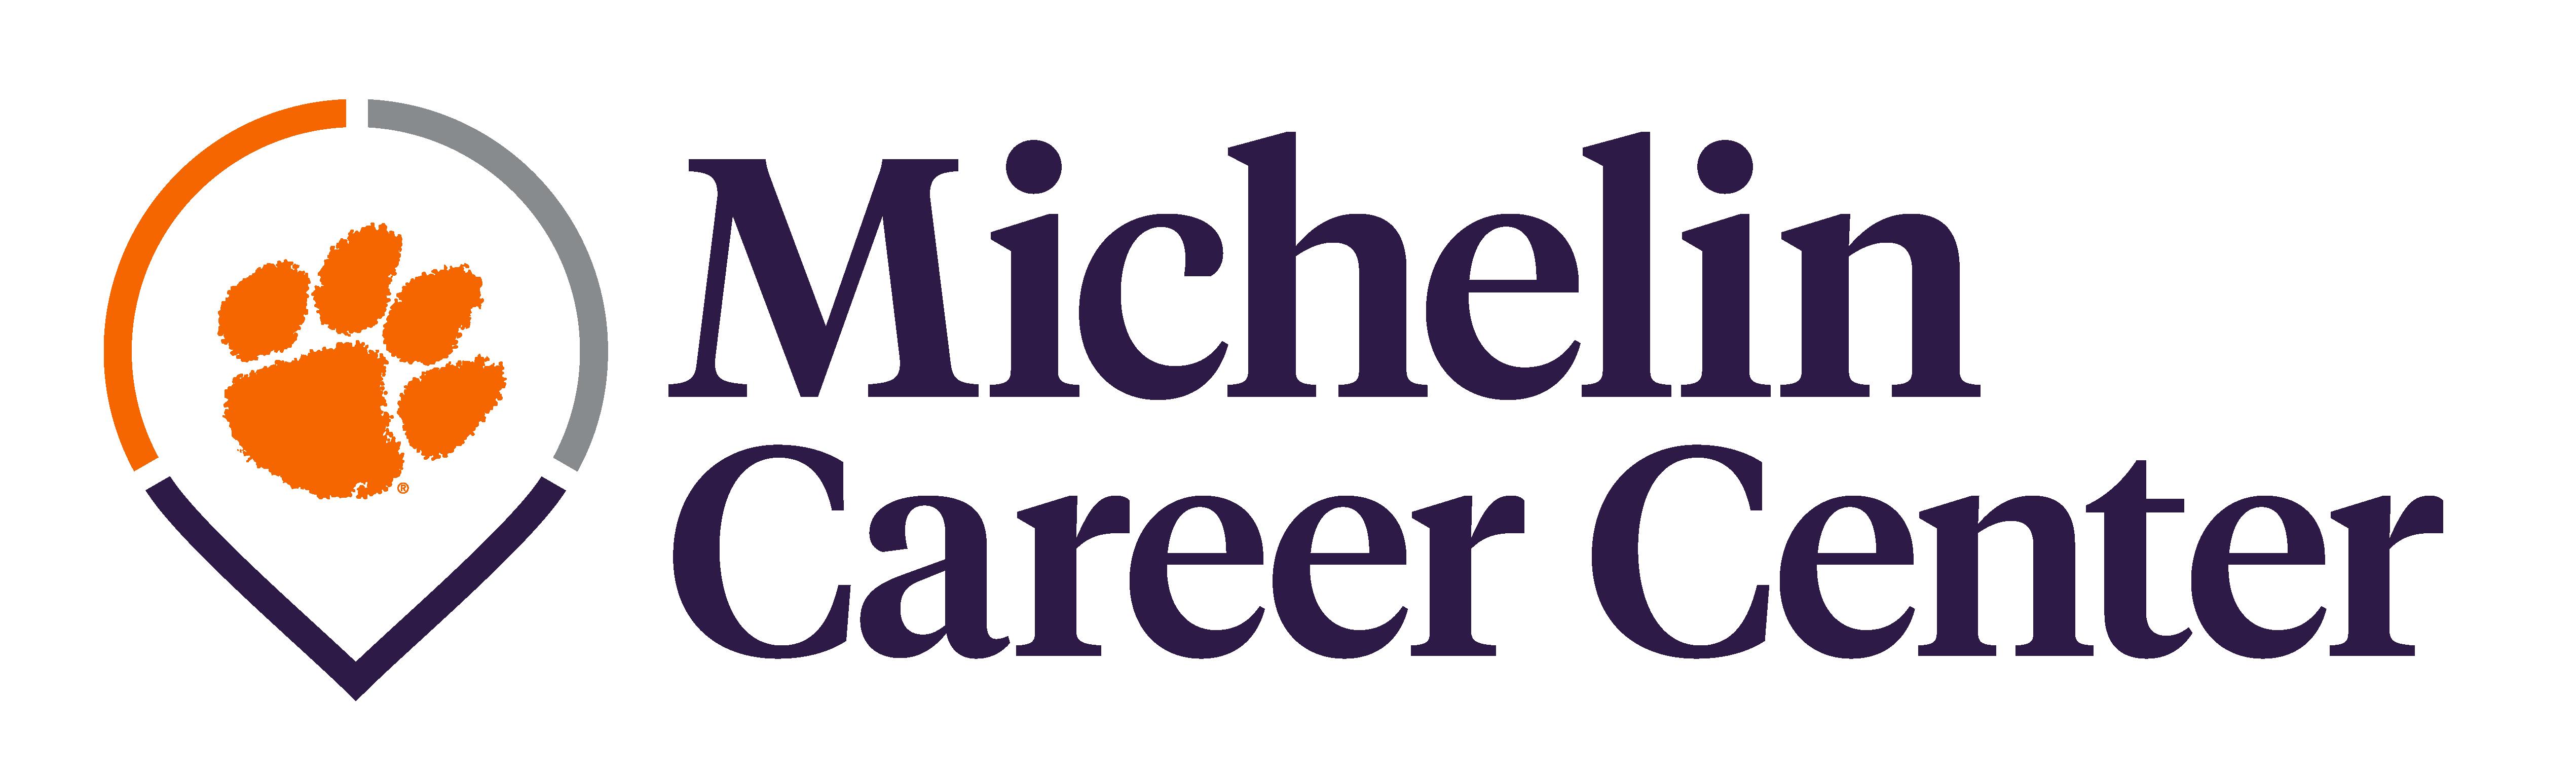 Michelin Career Center